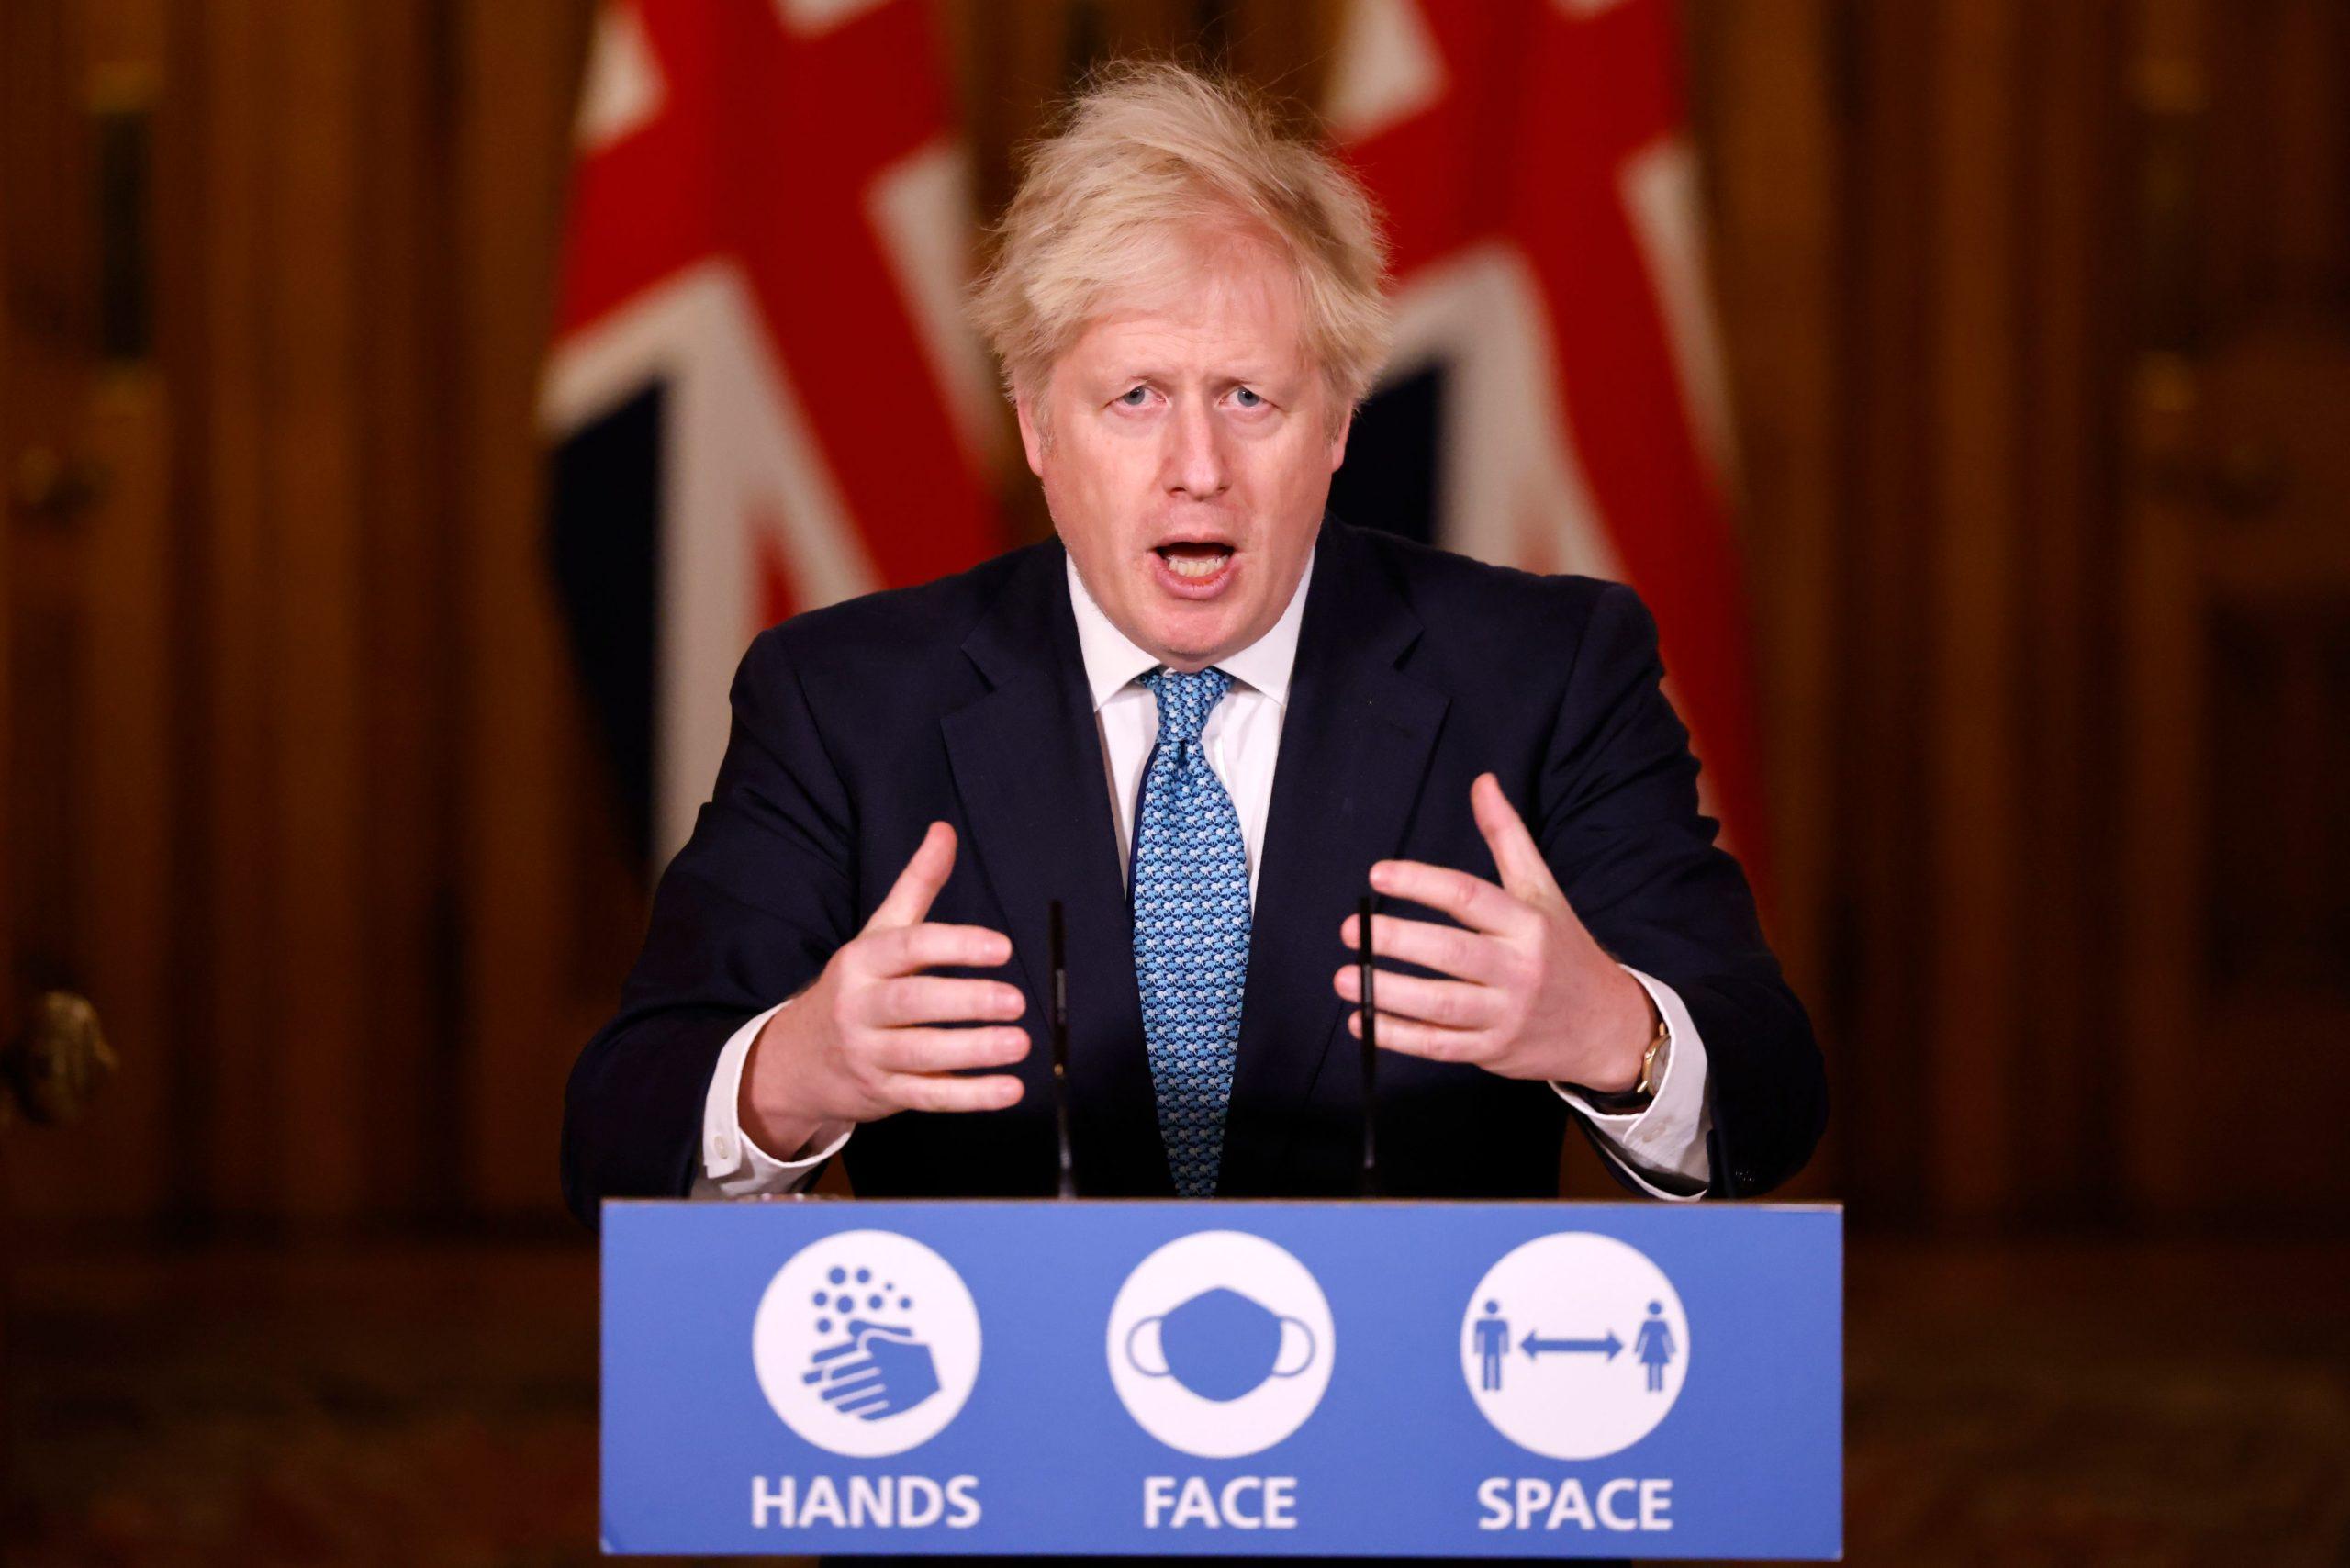 Britain's Prime Minister Boris Johnson speaks during a press conference on Saturday the new coronavirus strain. (Tolga Akmen/AFP via Getty Images)